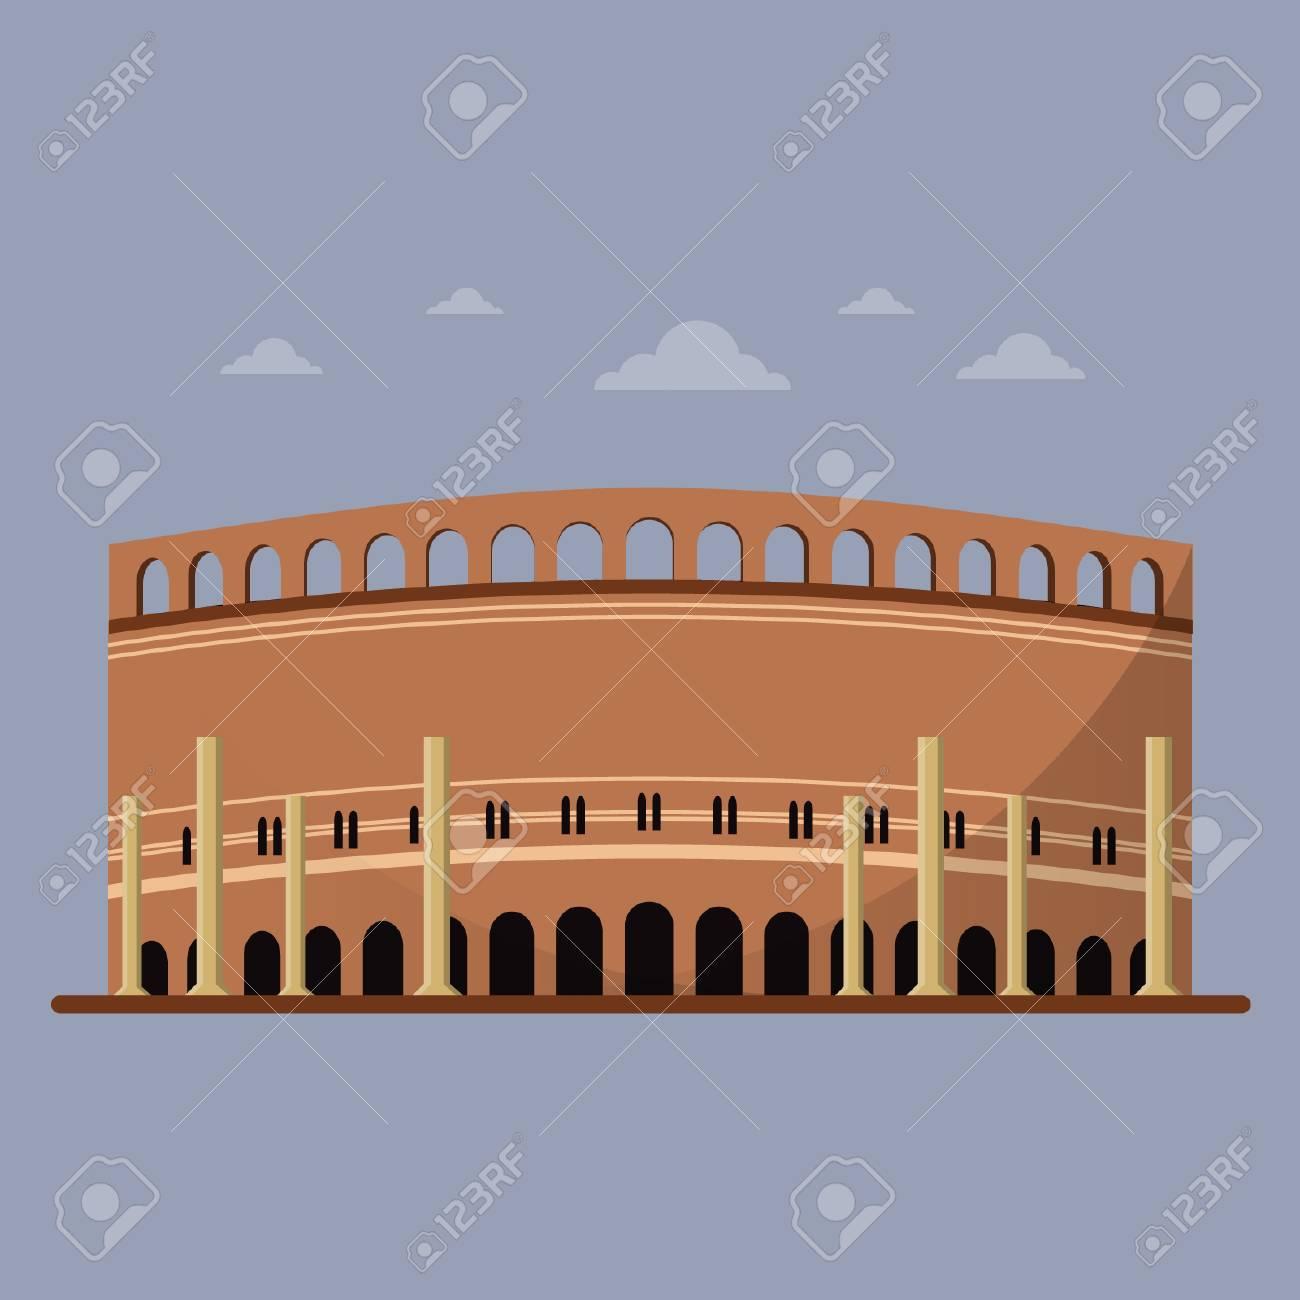 Gaddaffi Stadium - Landmark of Lahore Pakistan - 110619485